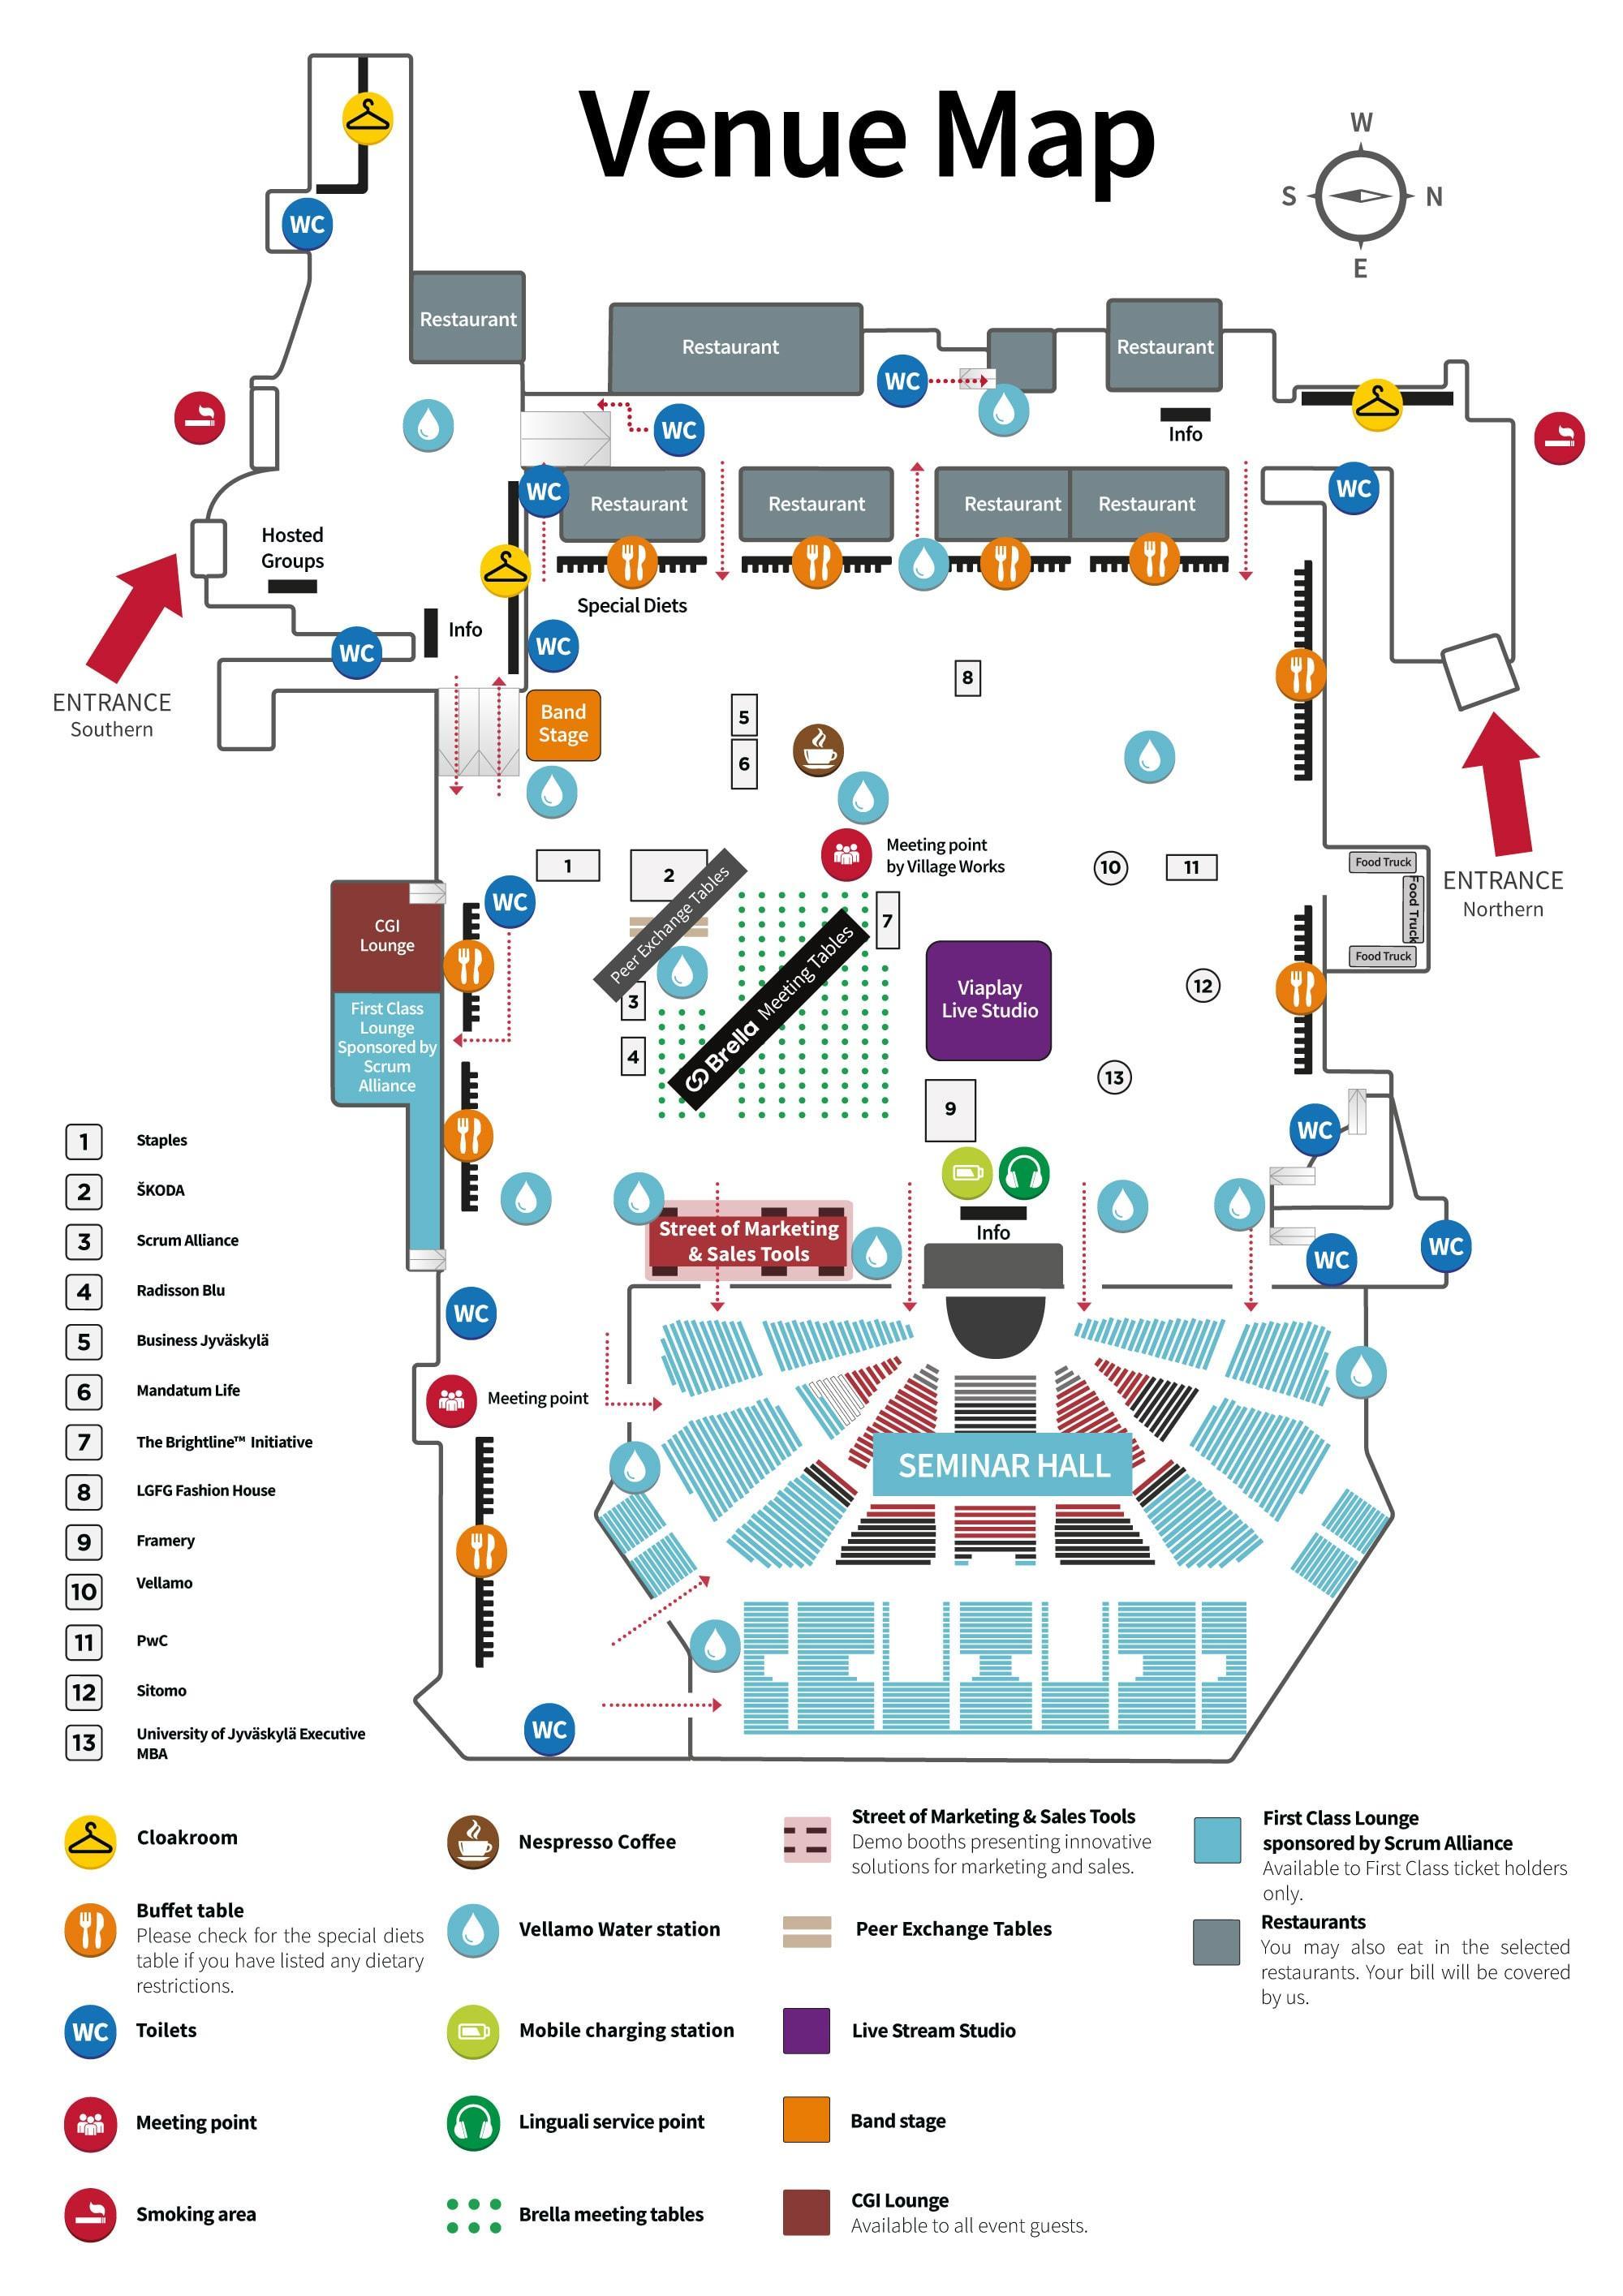 NBF2019 Venue map